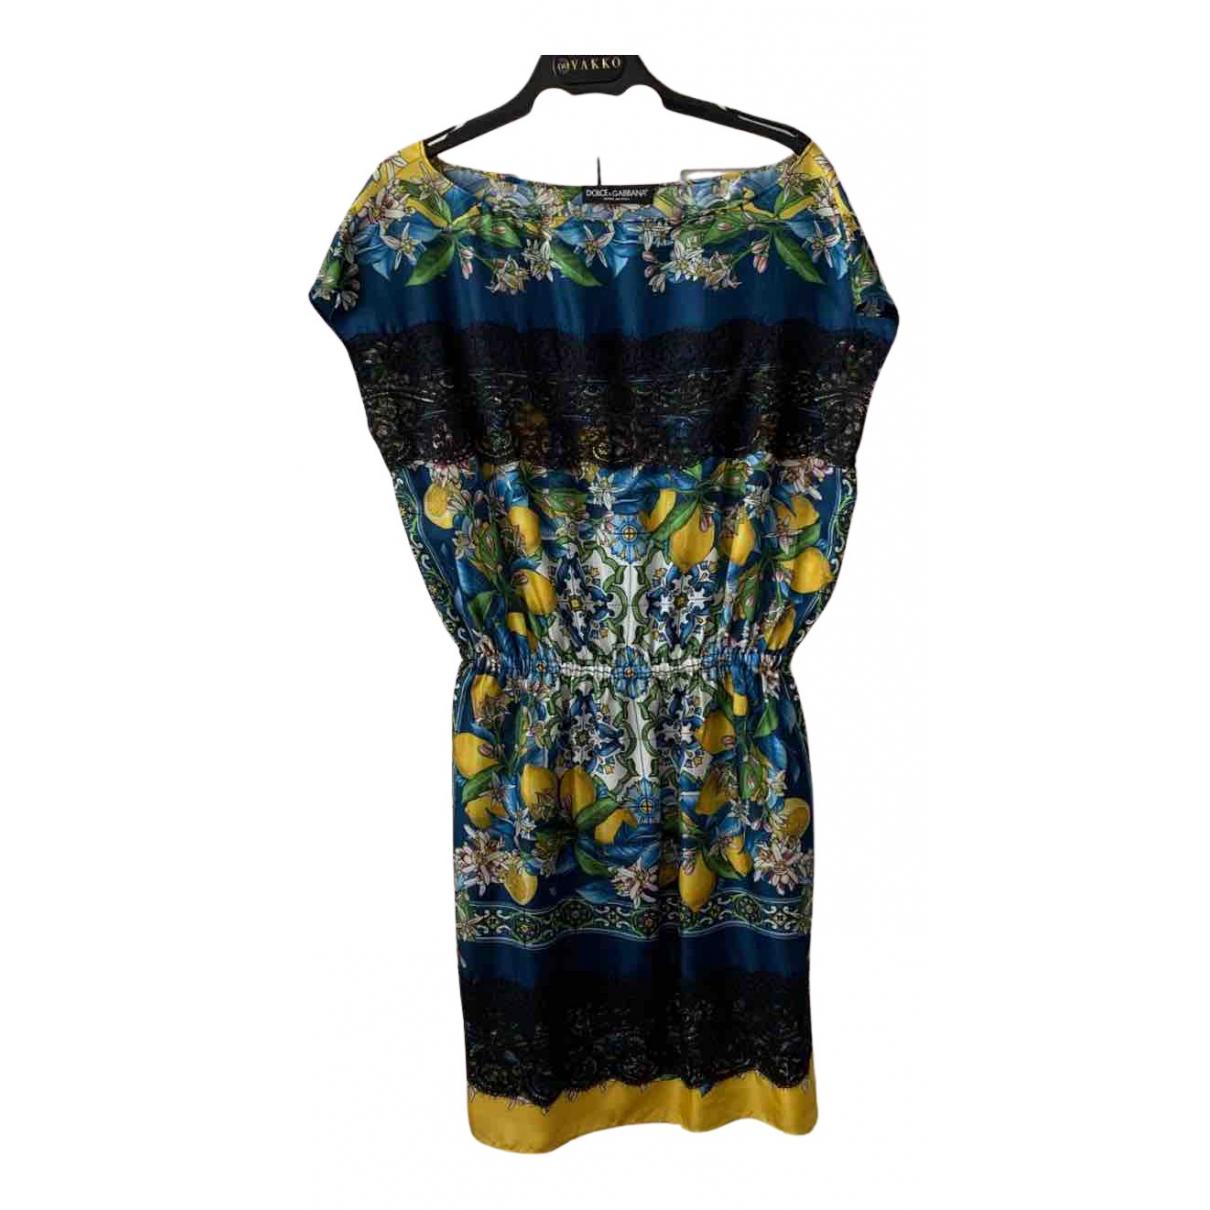 Dolce & Gabbana N Multicolour Silk dress for Women 40 IT